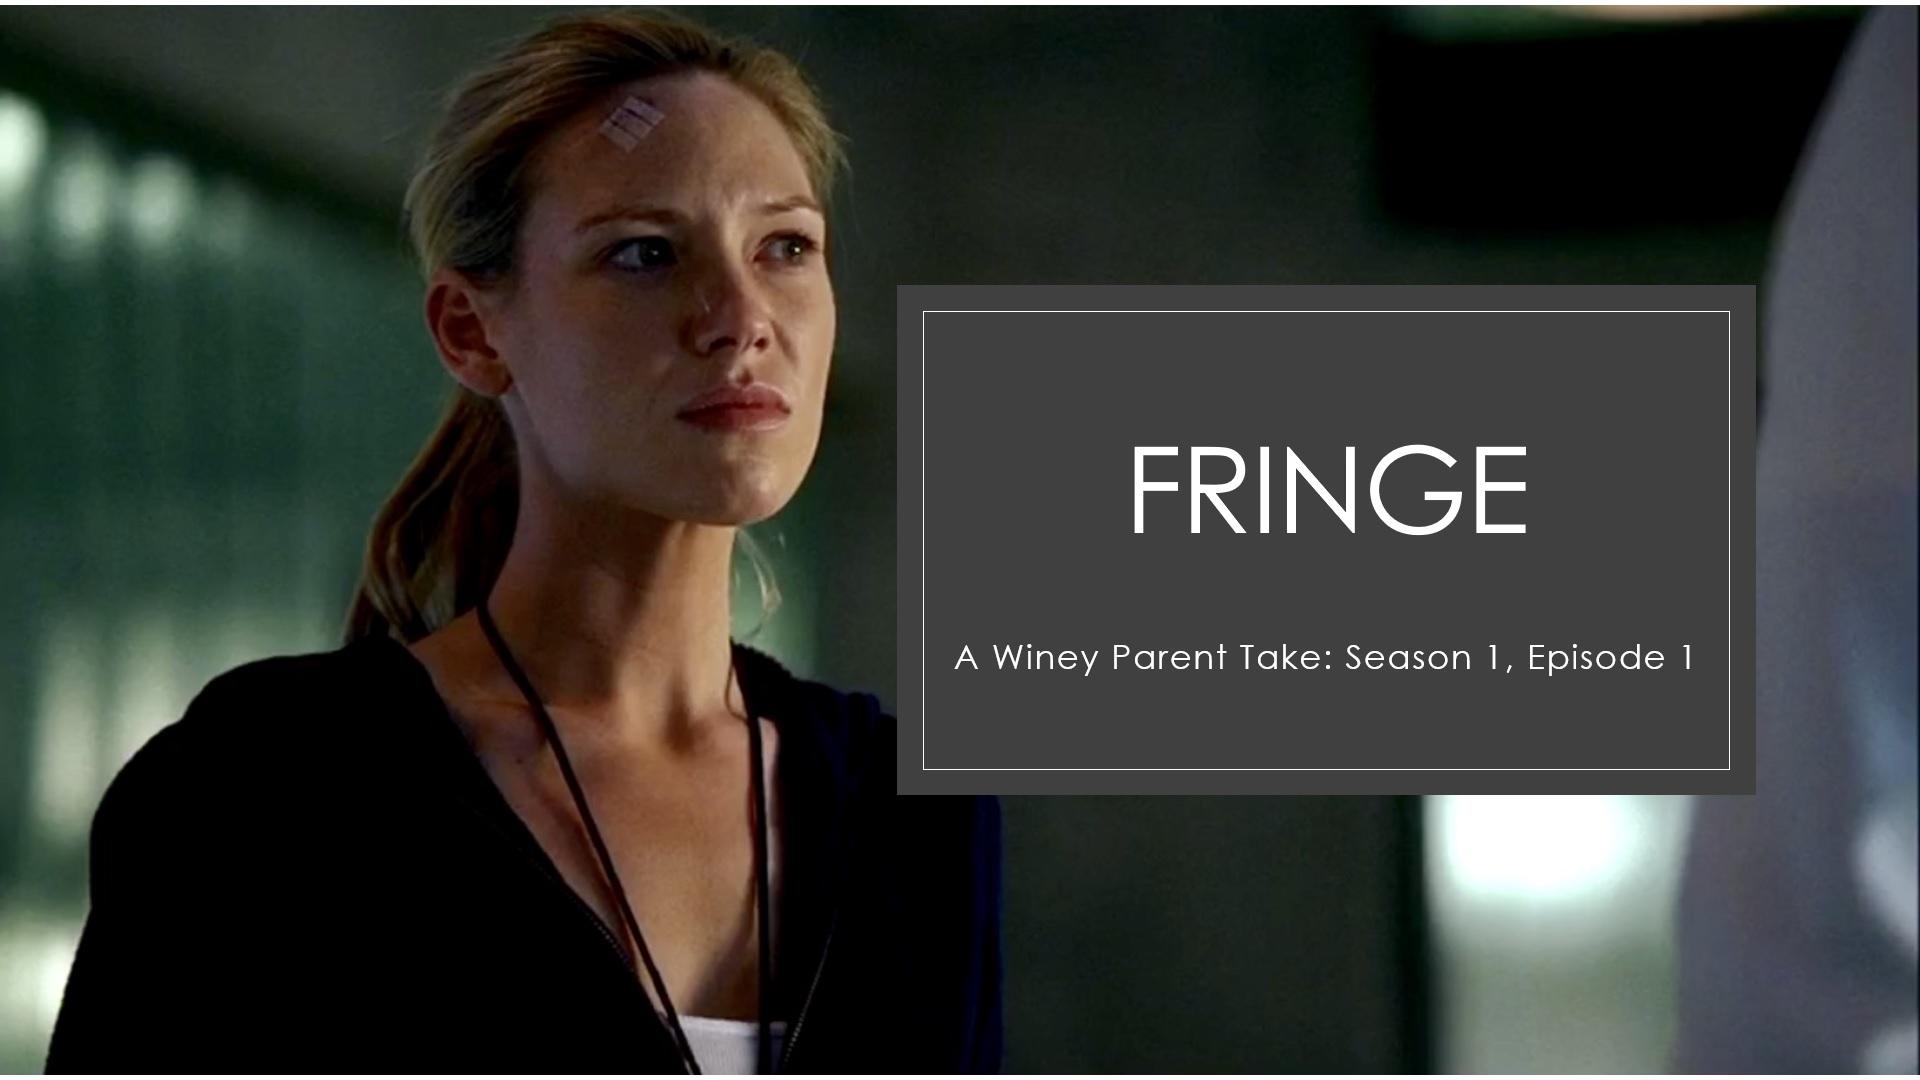 A Winey Parent Take: Fringe Season 1 Episode 1